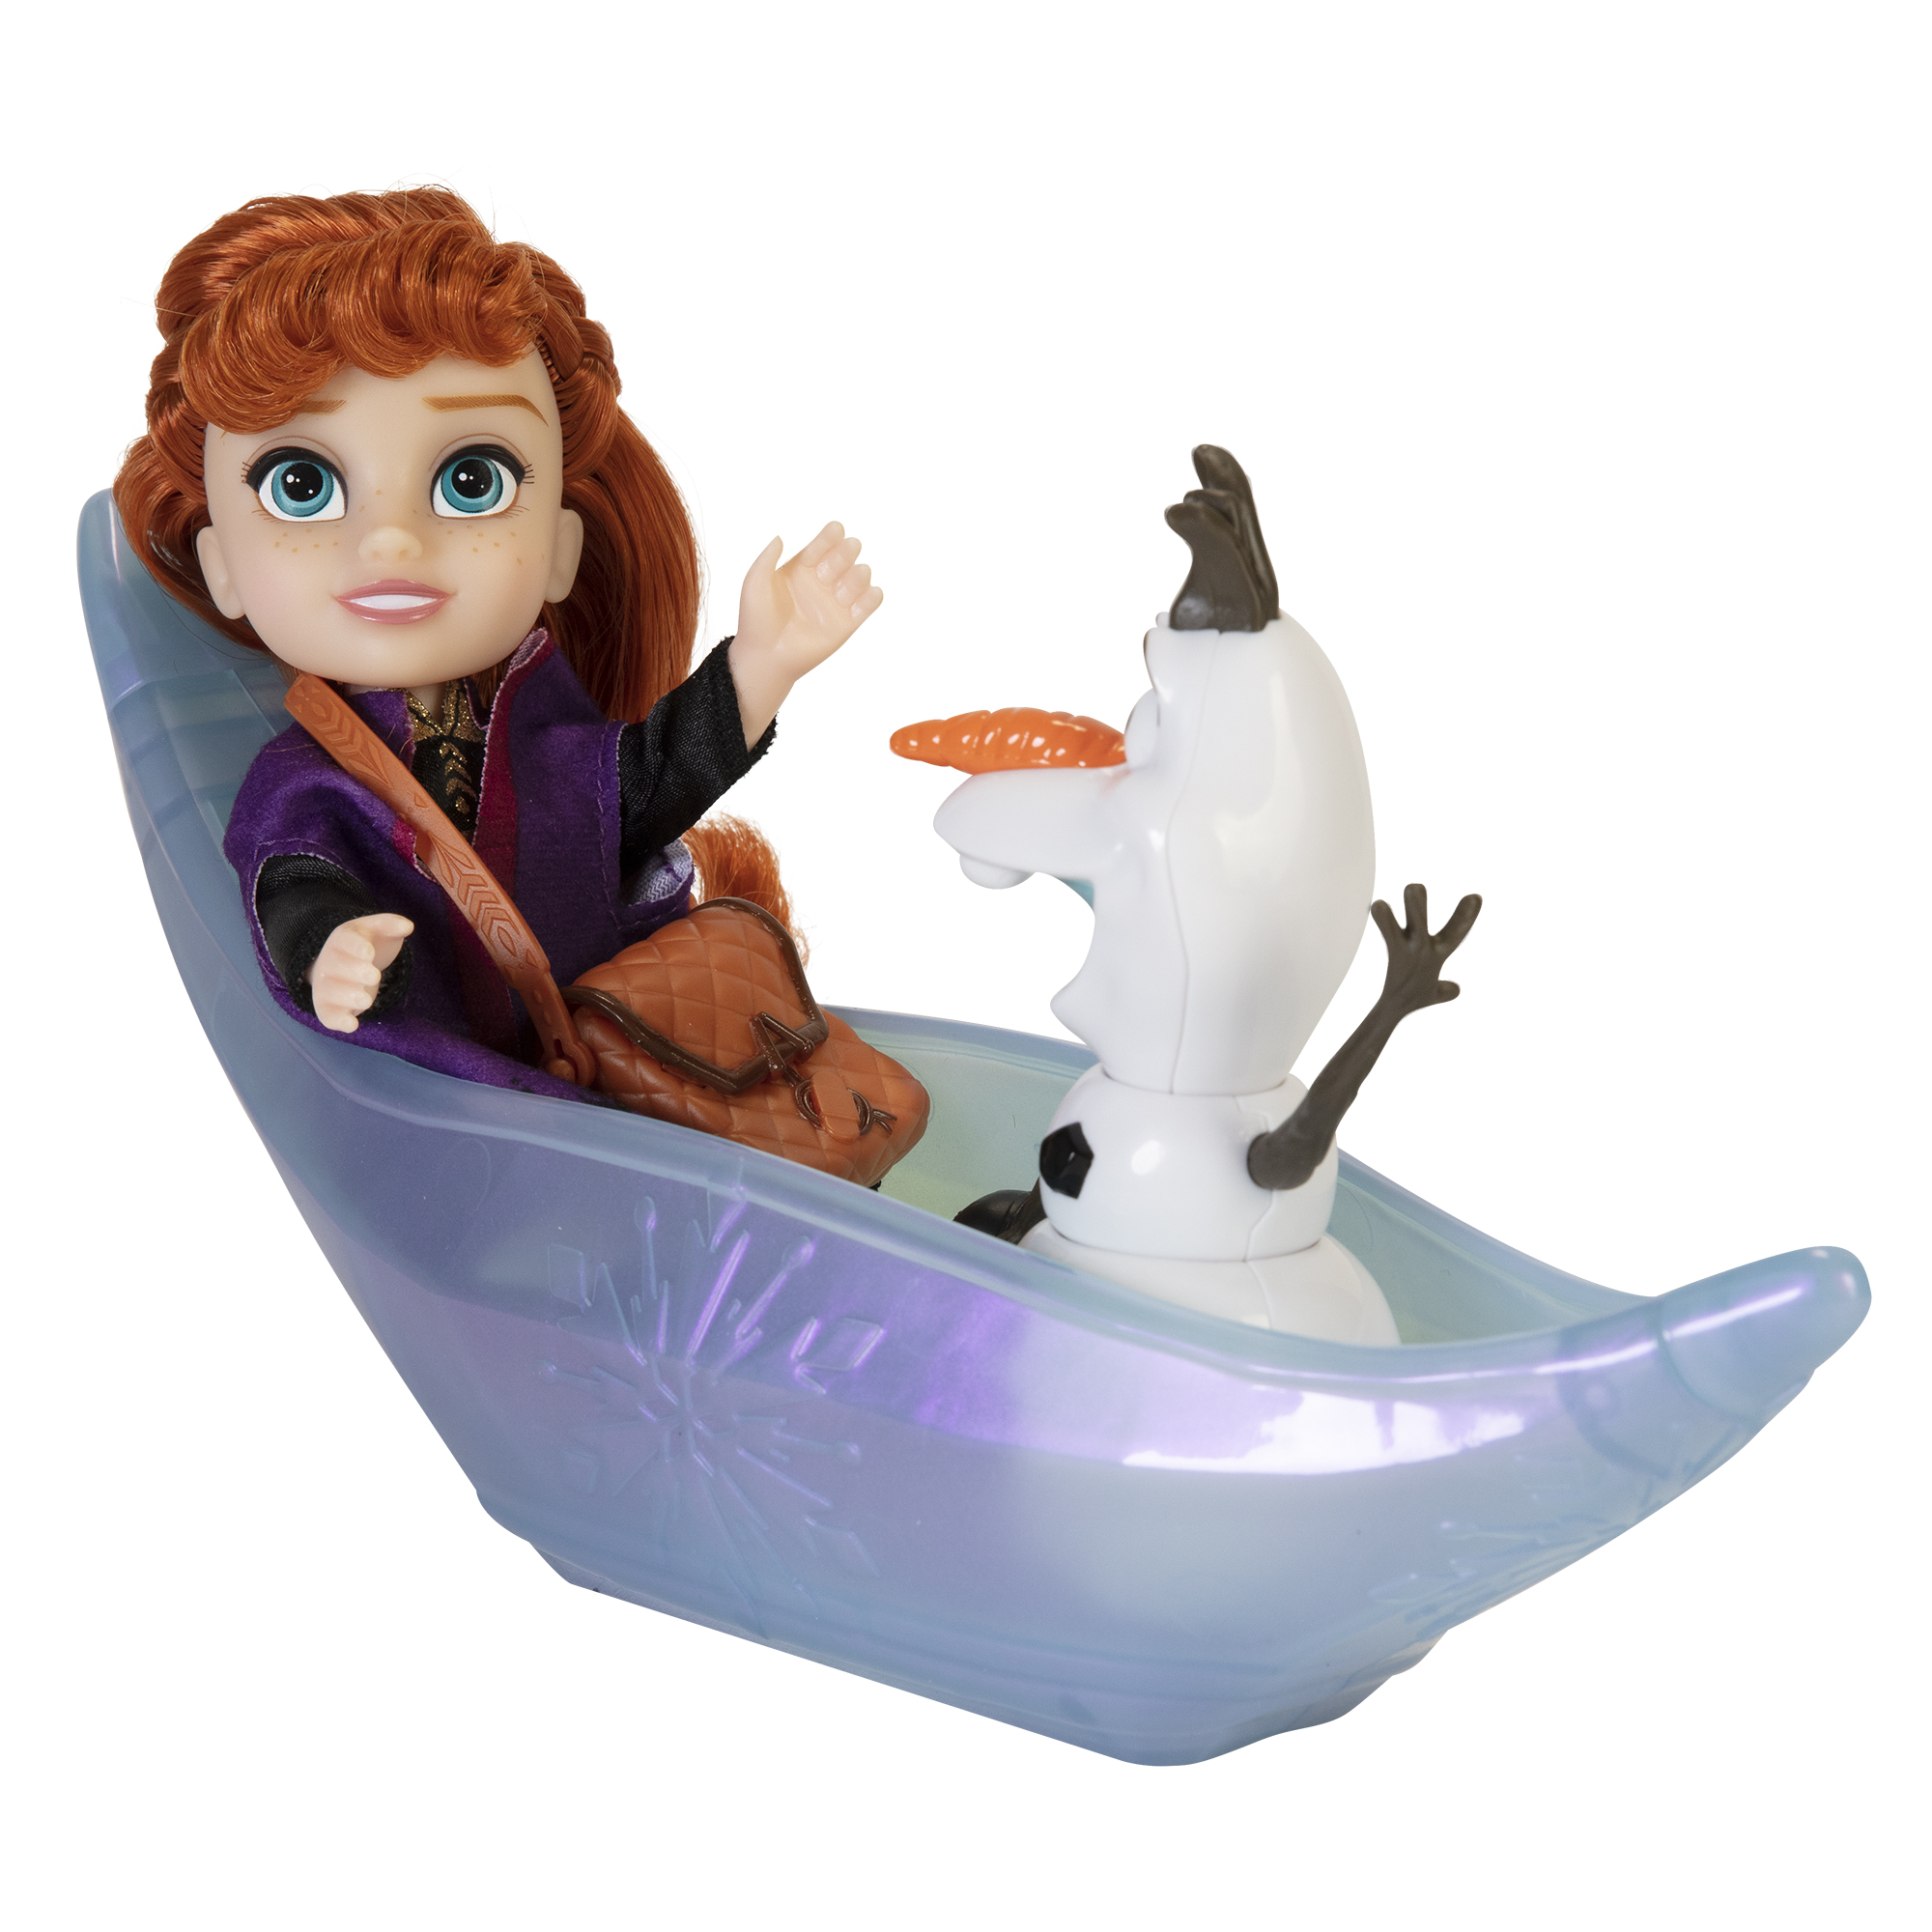 Disney Frozen 2 Petite Princess Anna and Ice Canoe Dolls Gift Set